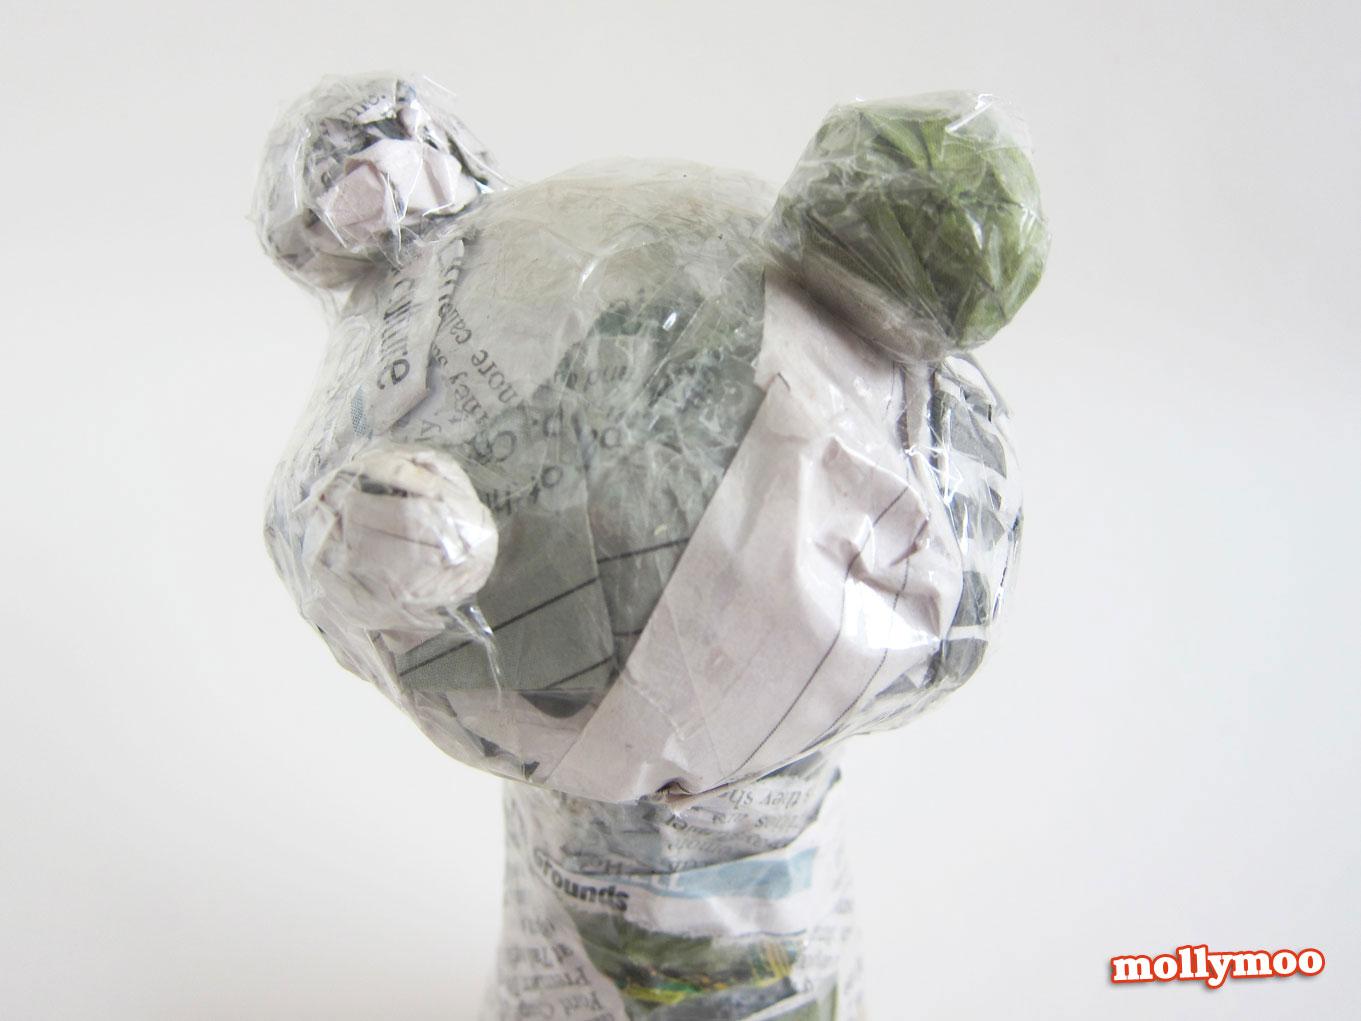 papier mache craft for kids